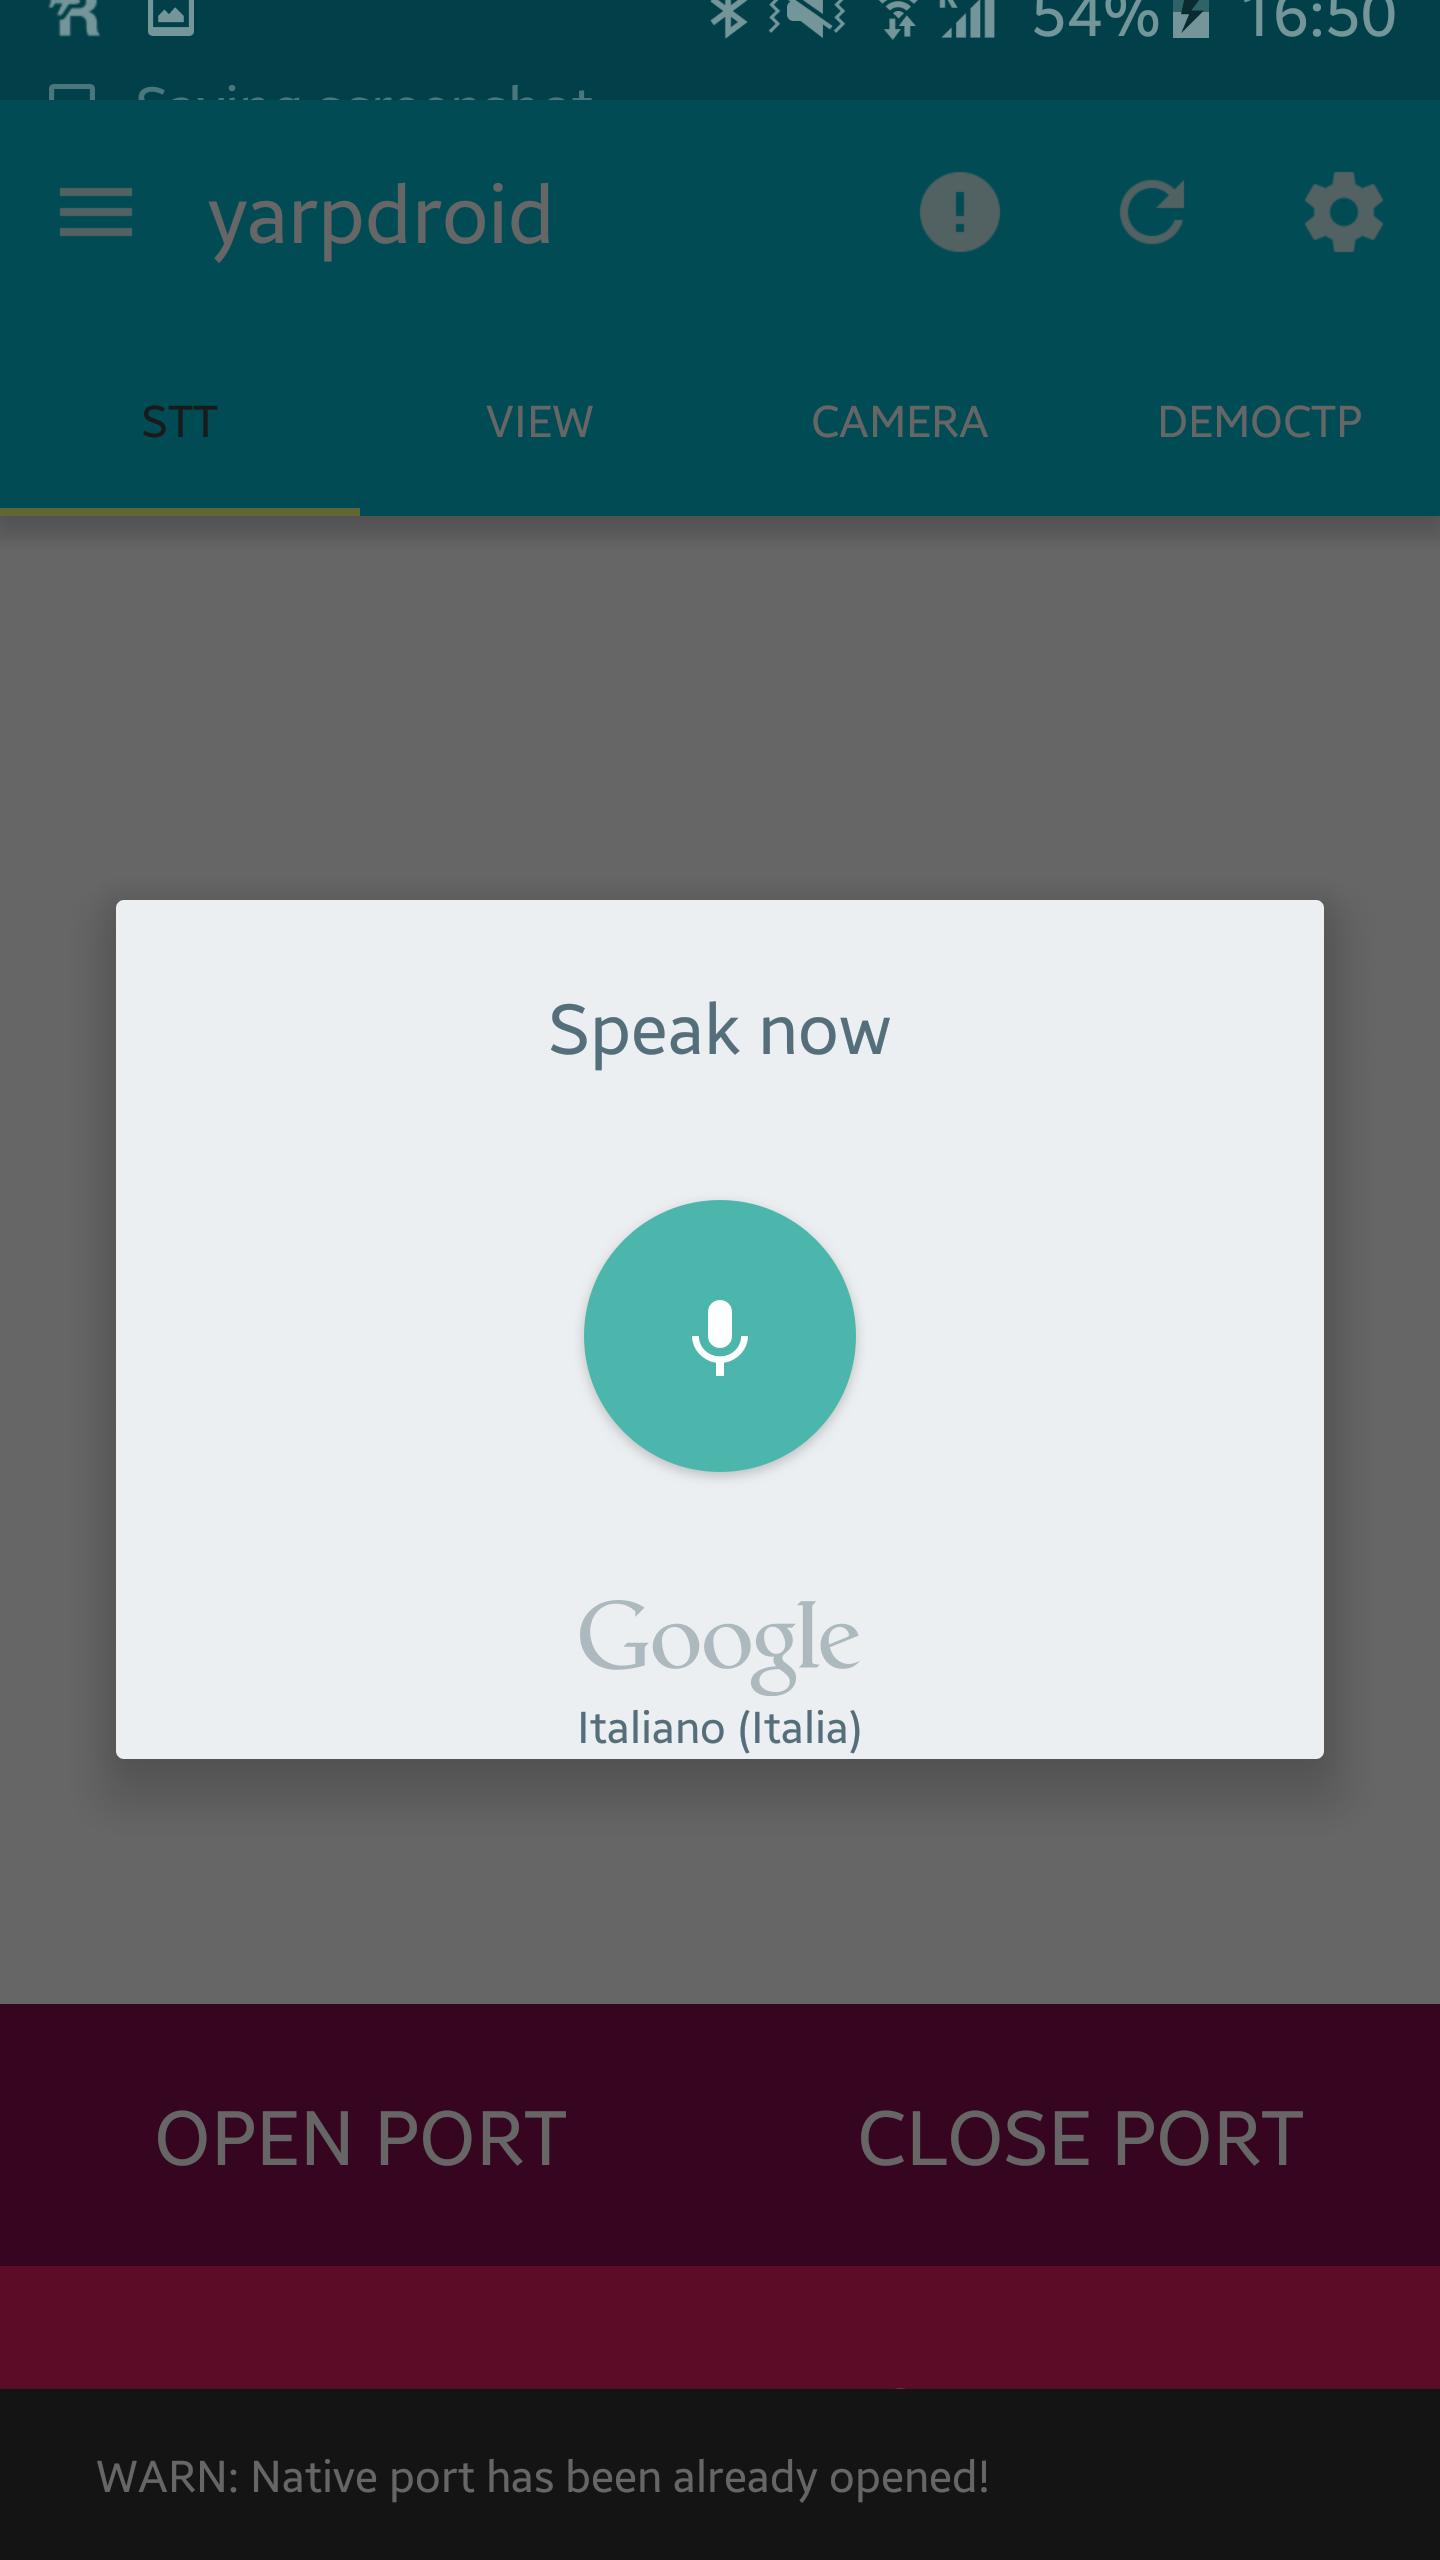 Android integration onto the iCub platform - Alessandro Roncone - Ph D